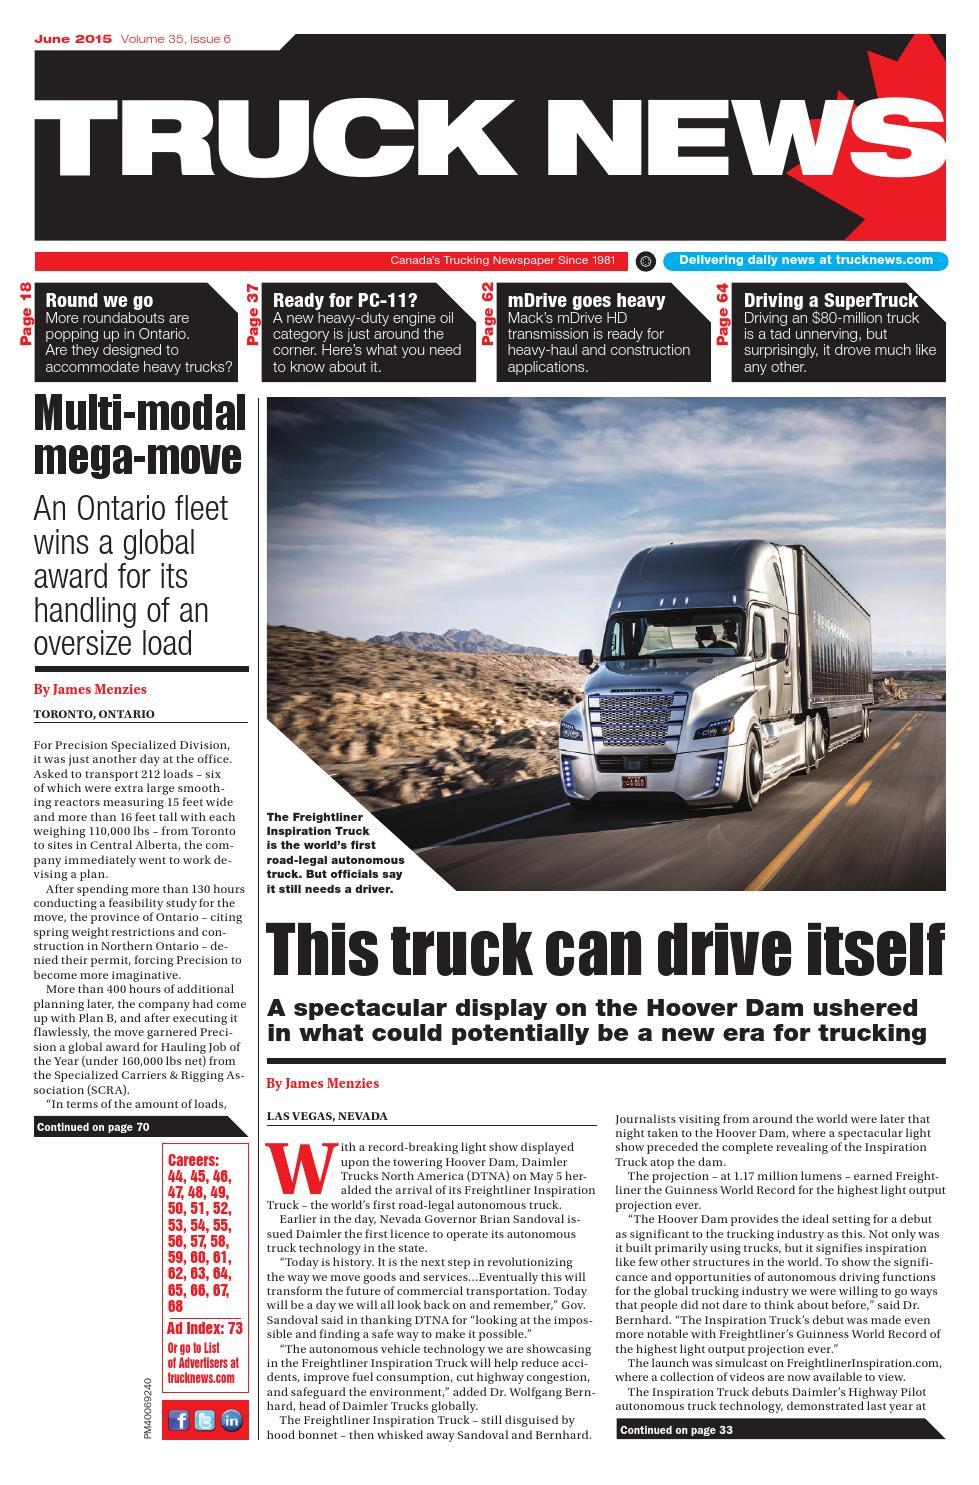 Truck News June 2015 by Annex-Newcom LP - issuu